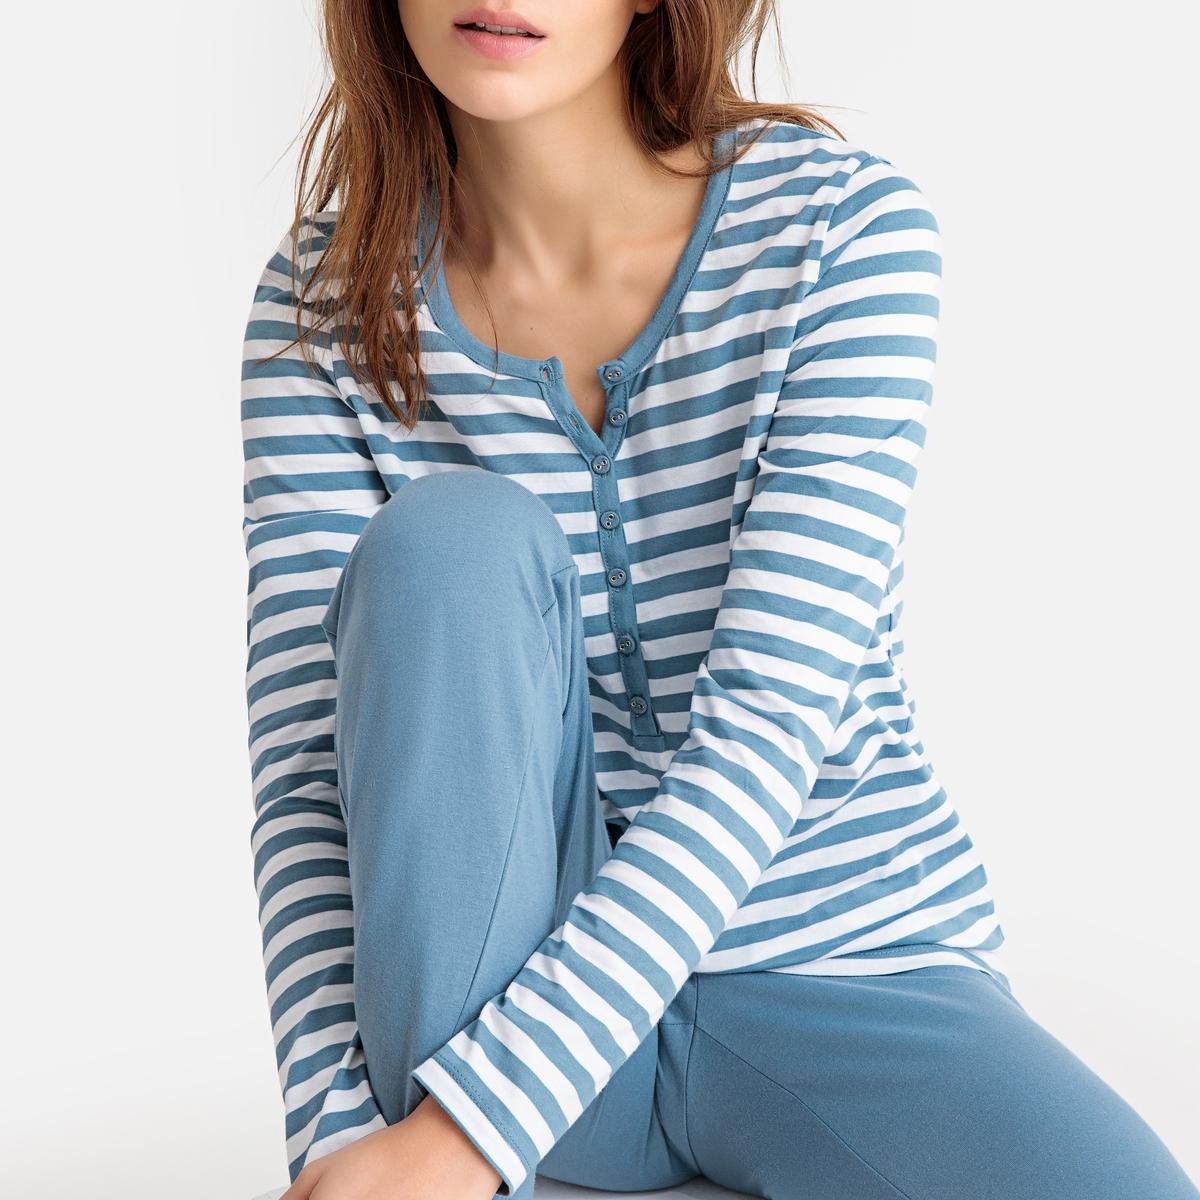 Pijama a rayas 100% algodón